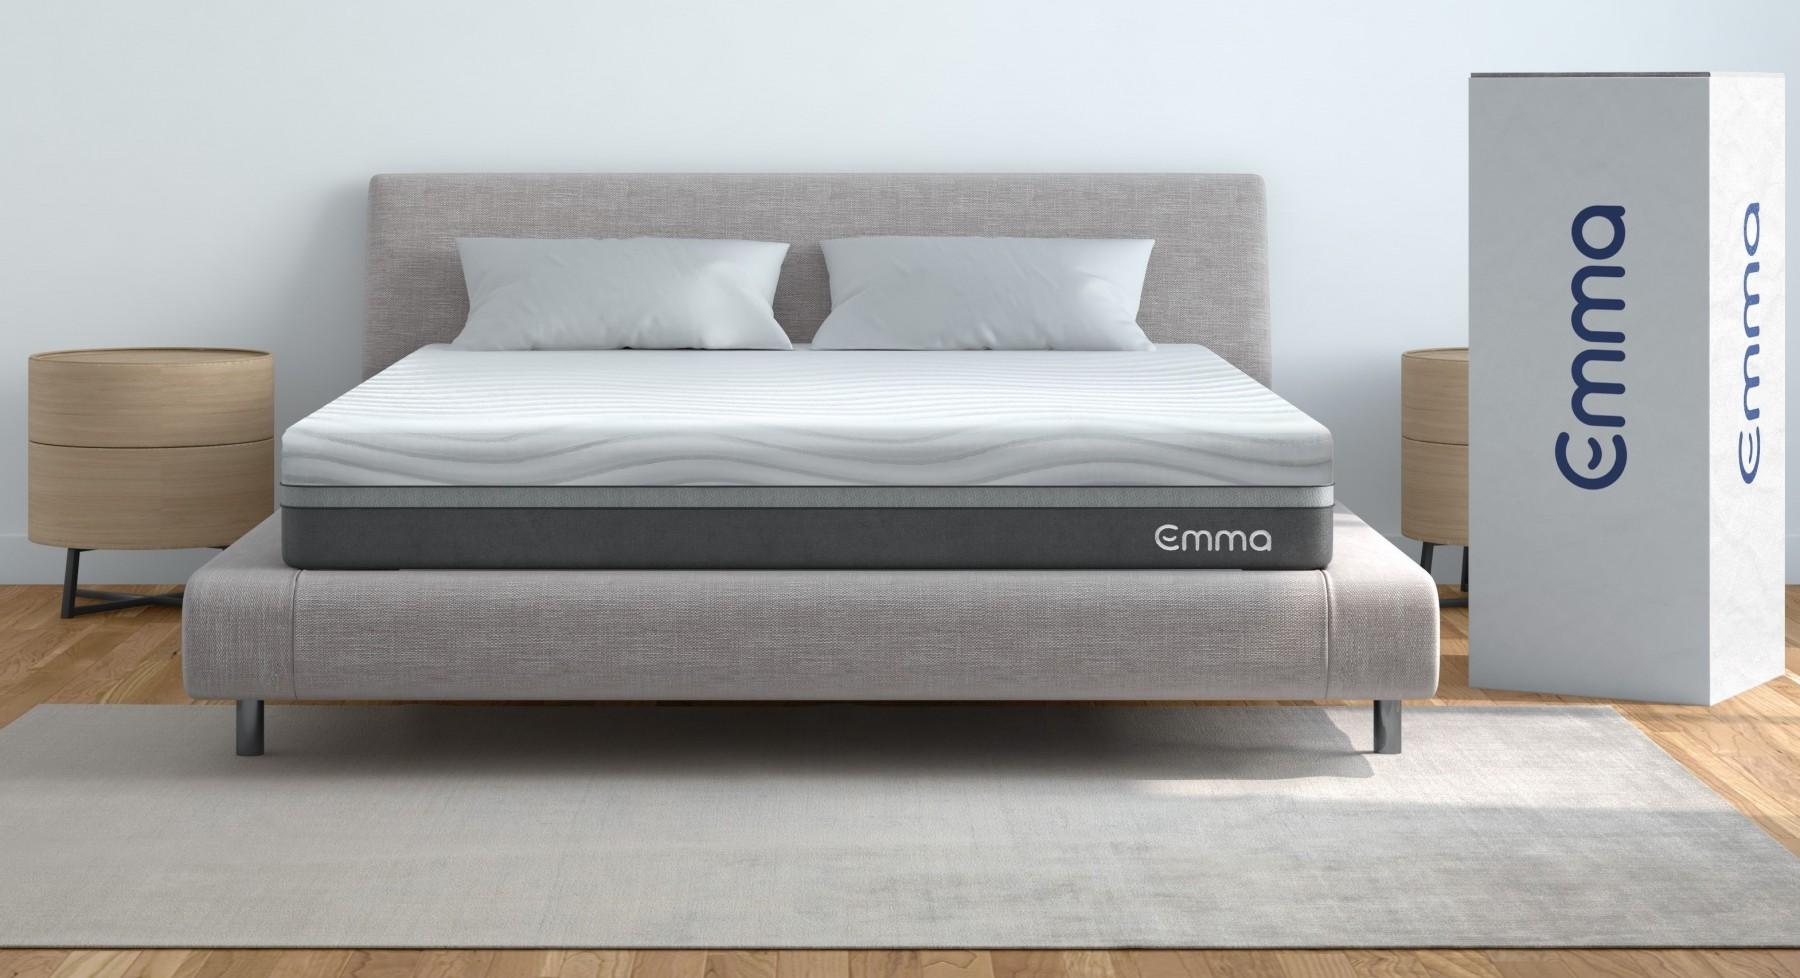 emma-mattress-products